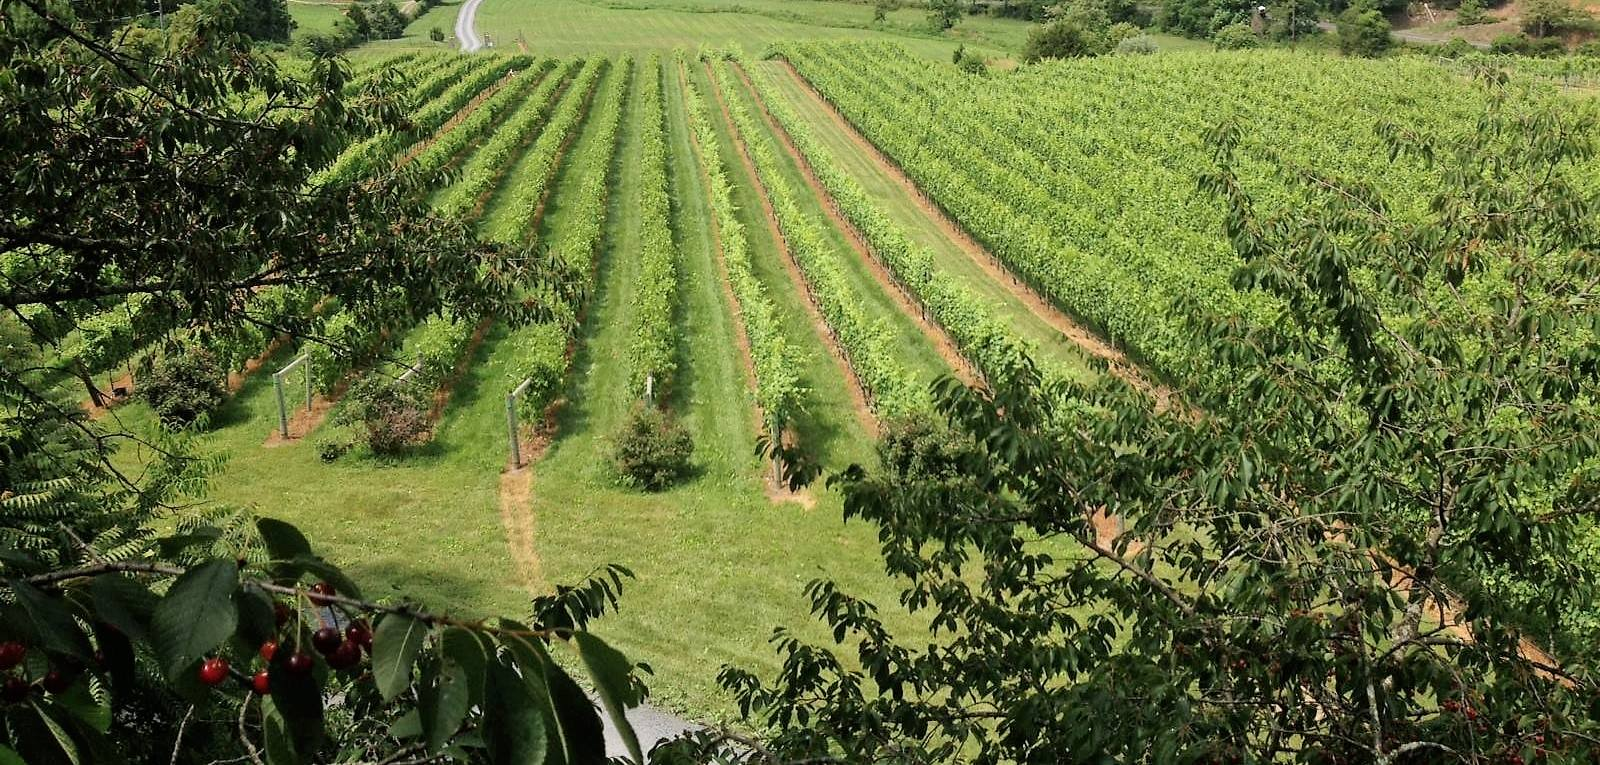 Shenandoah Valley Wine Trail